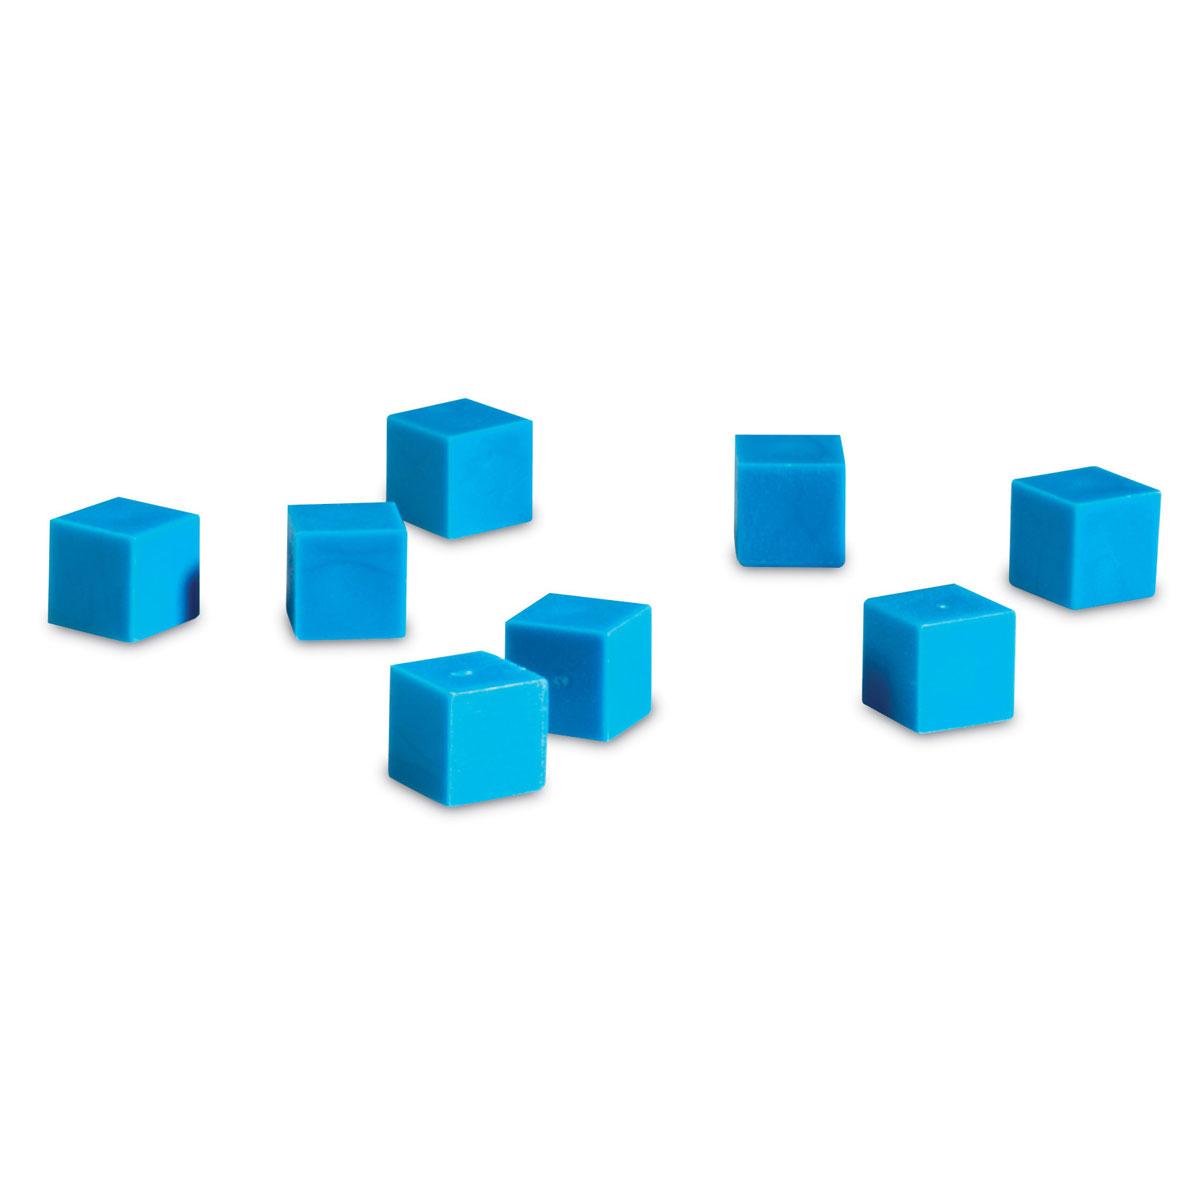 Grooved Base 10 Plastic Units